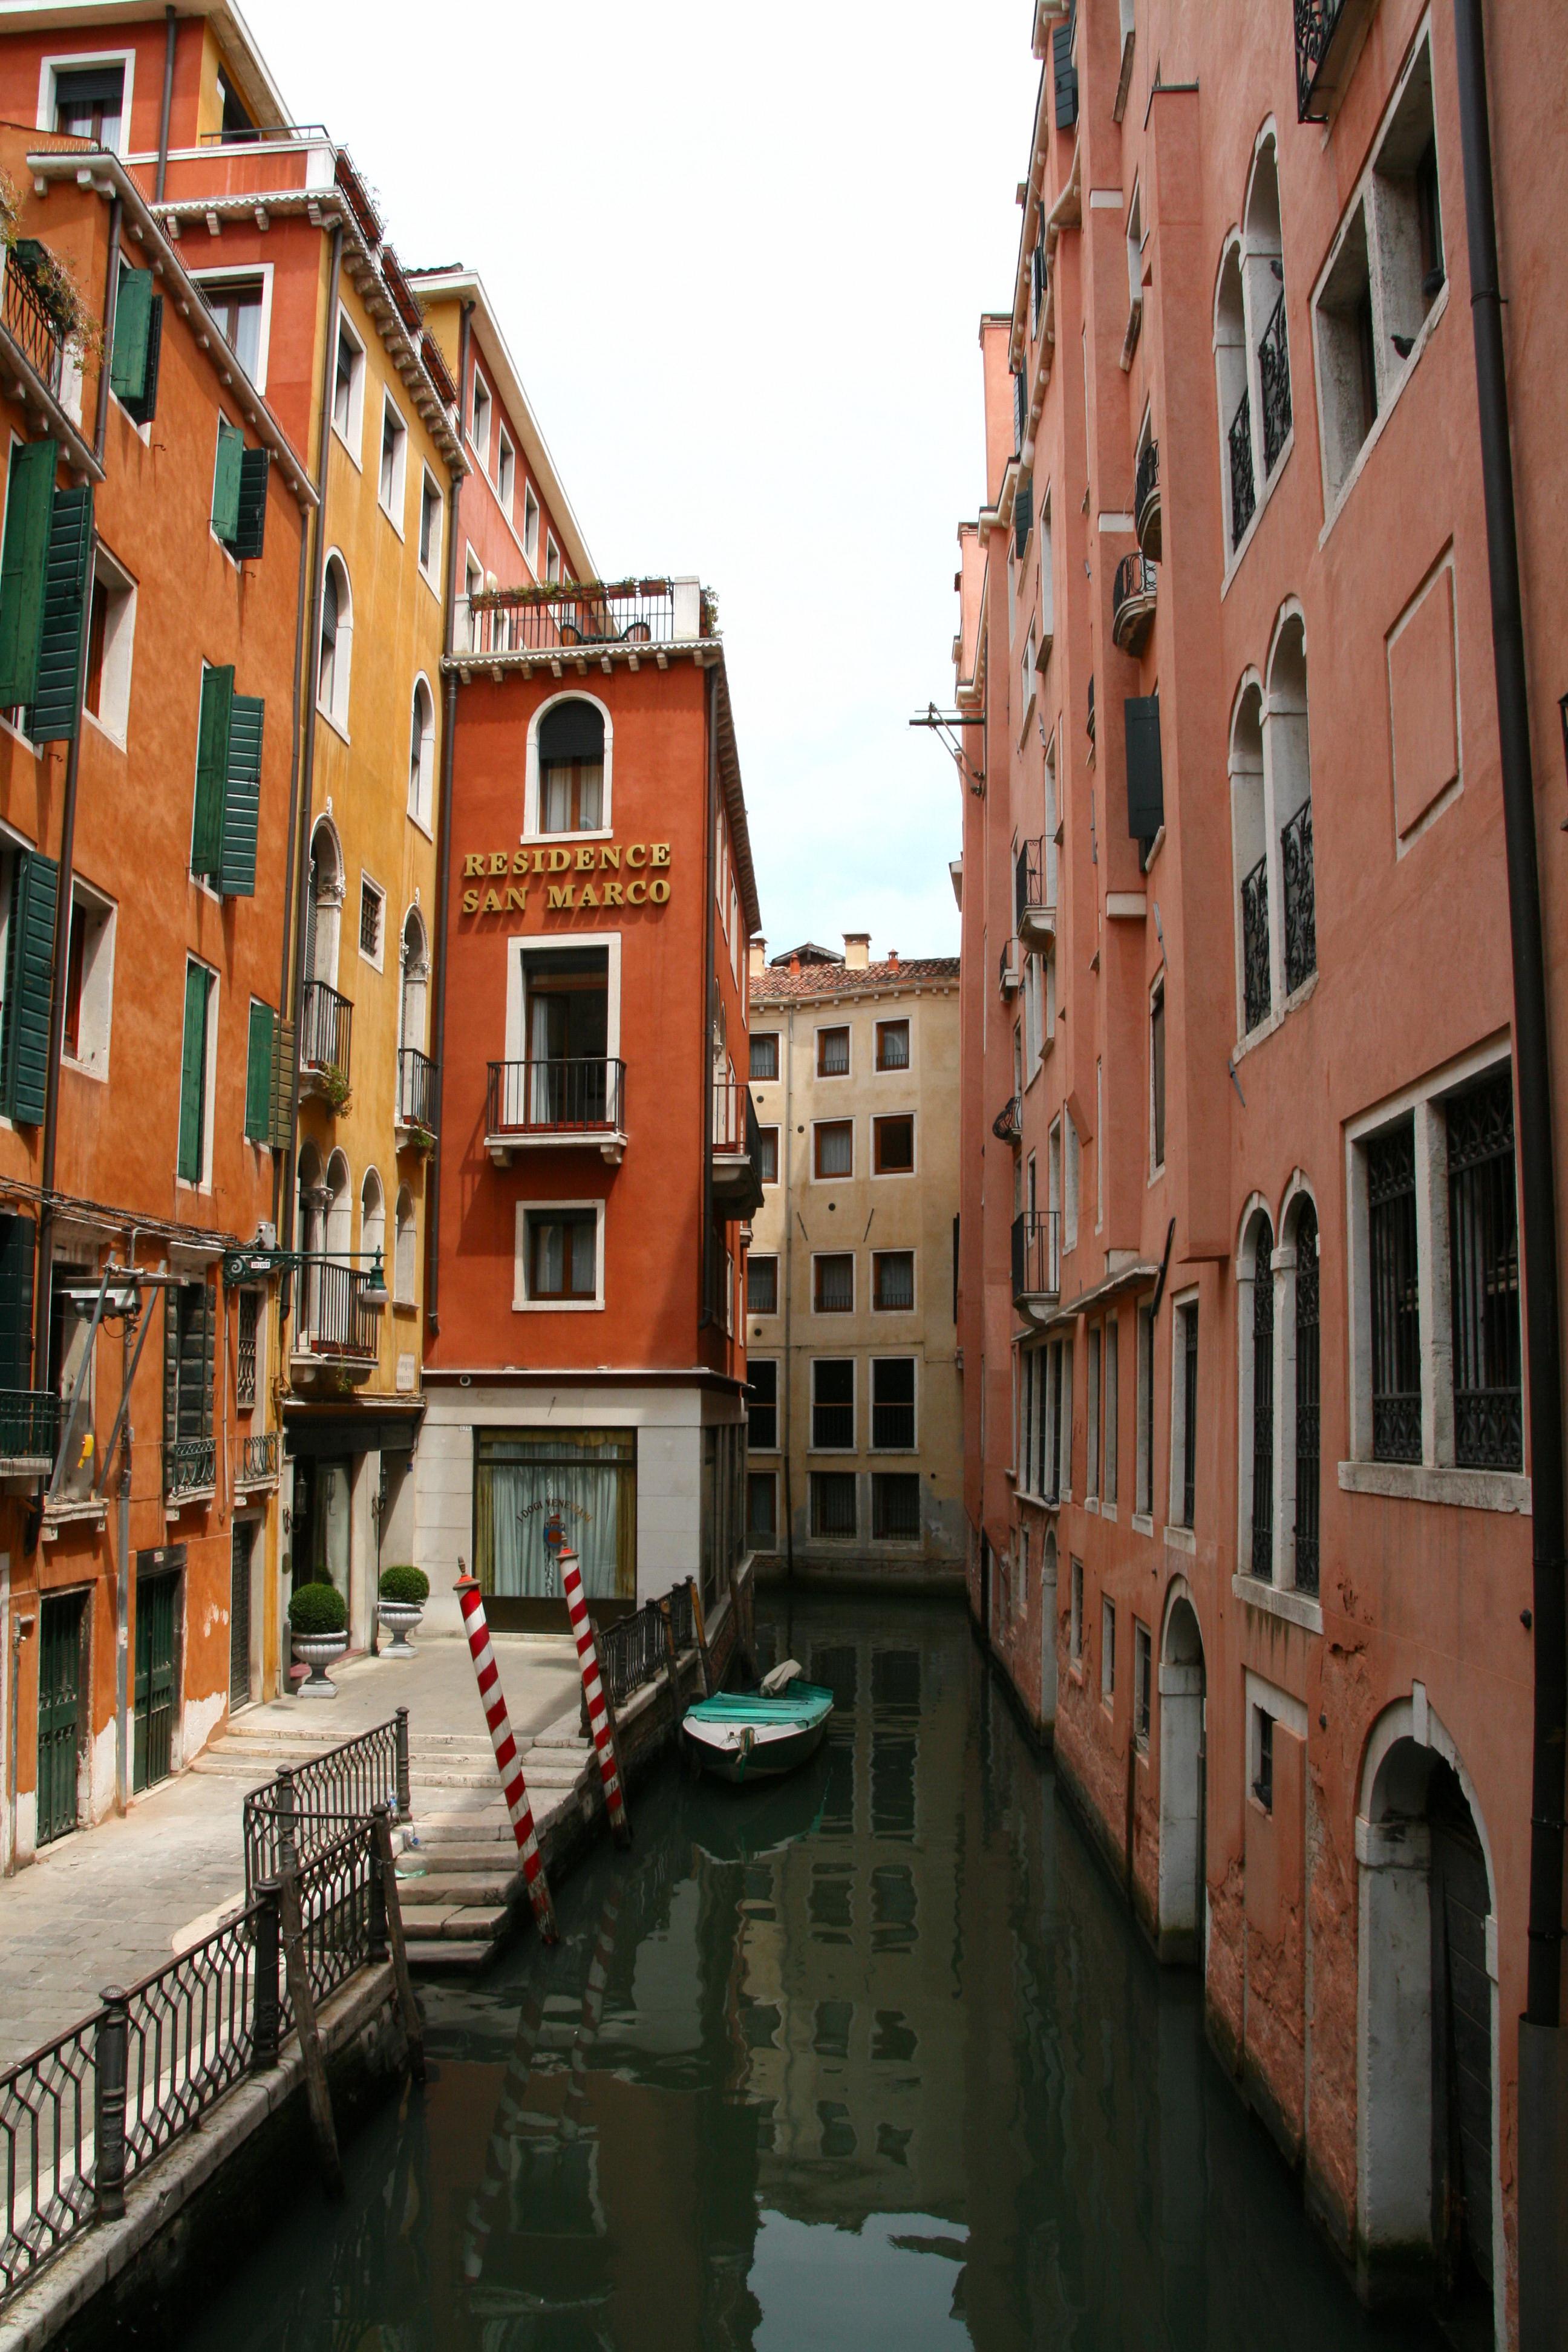 Venice Italy  City pictures : Venice italy 2007 Wikipedia, the free encyclopedia